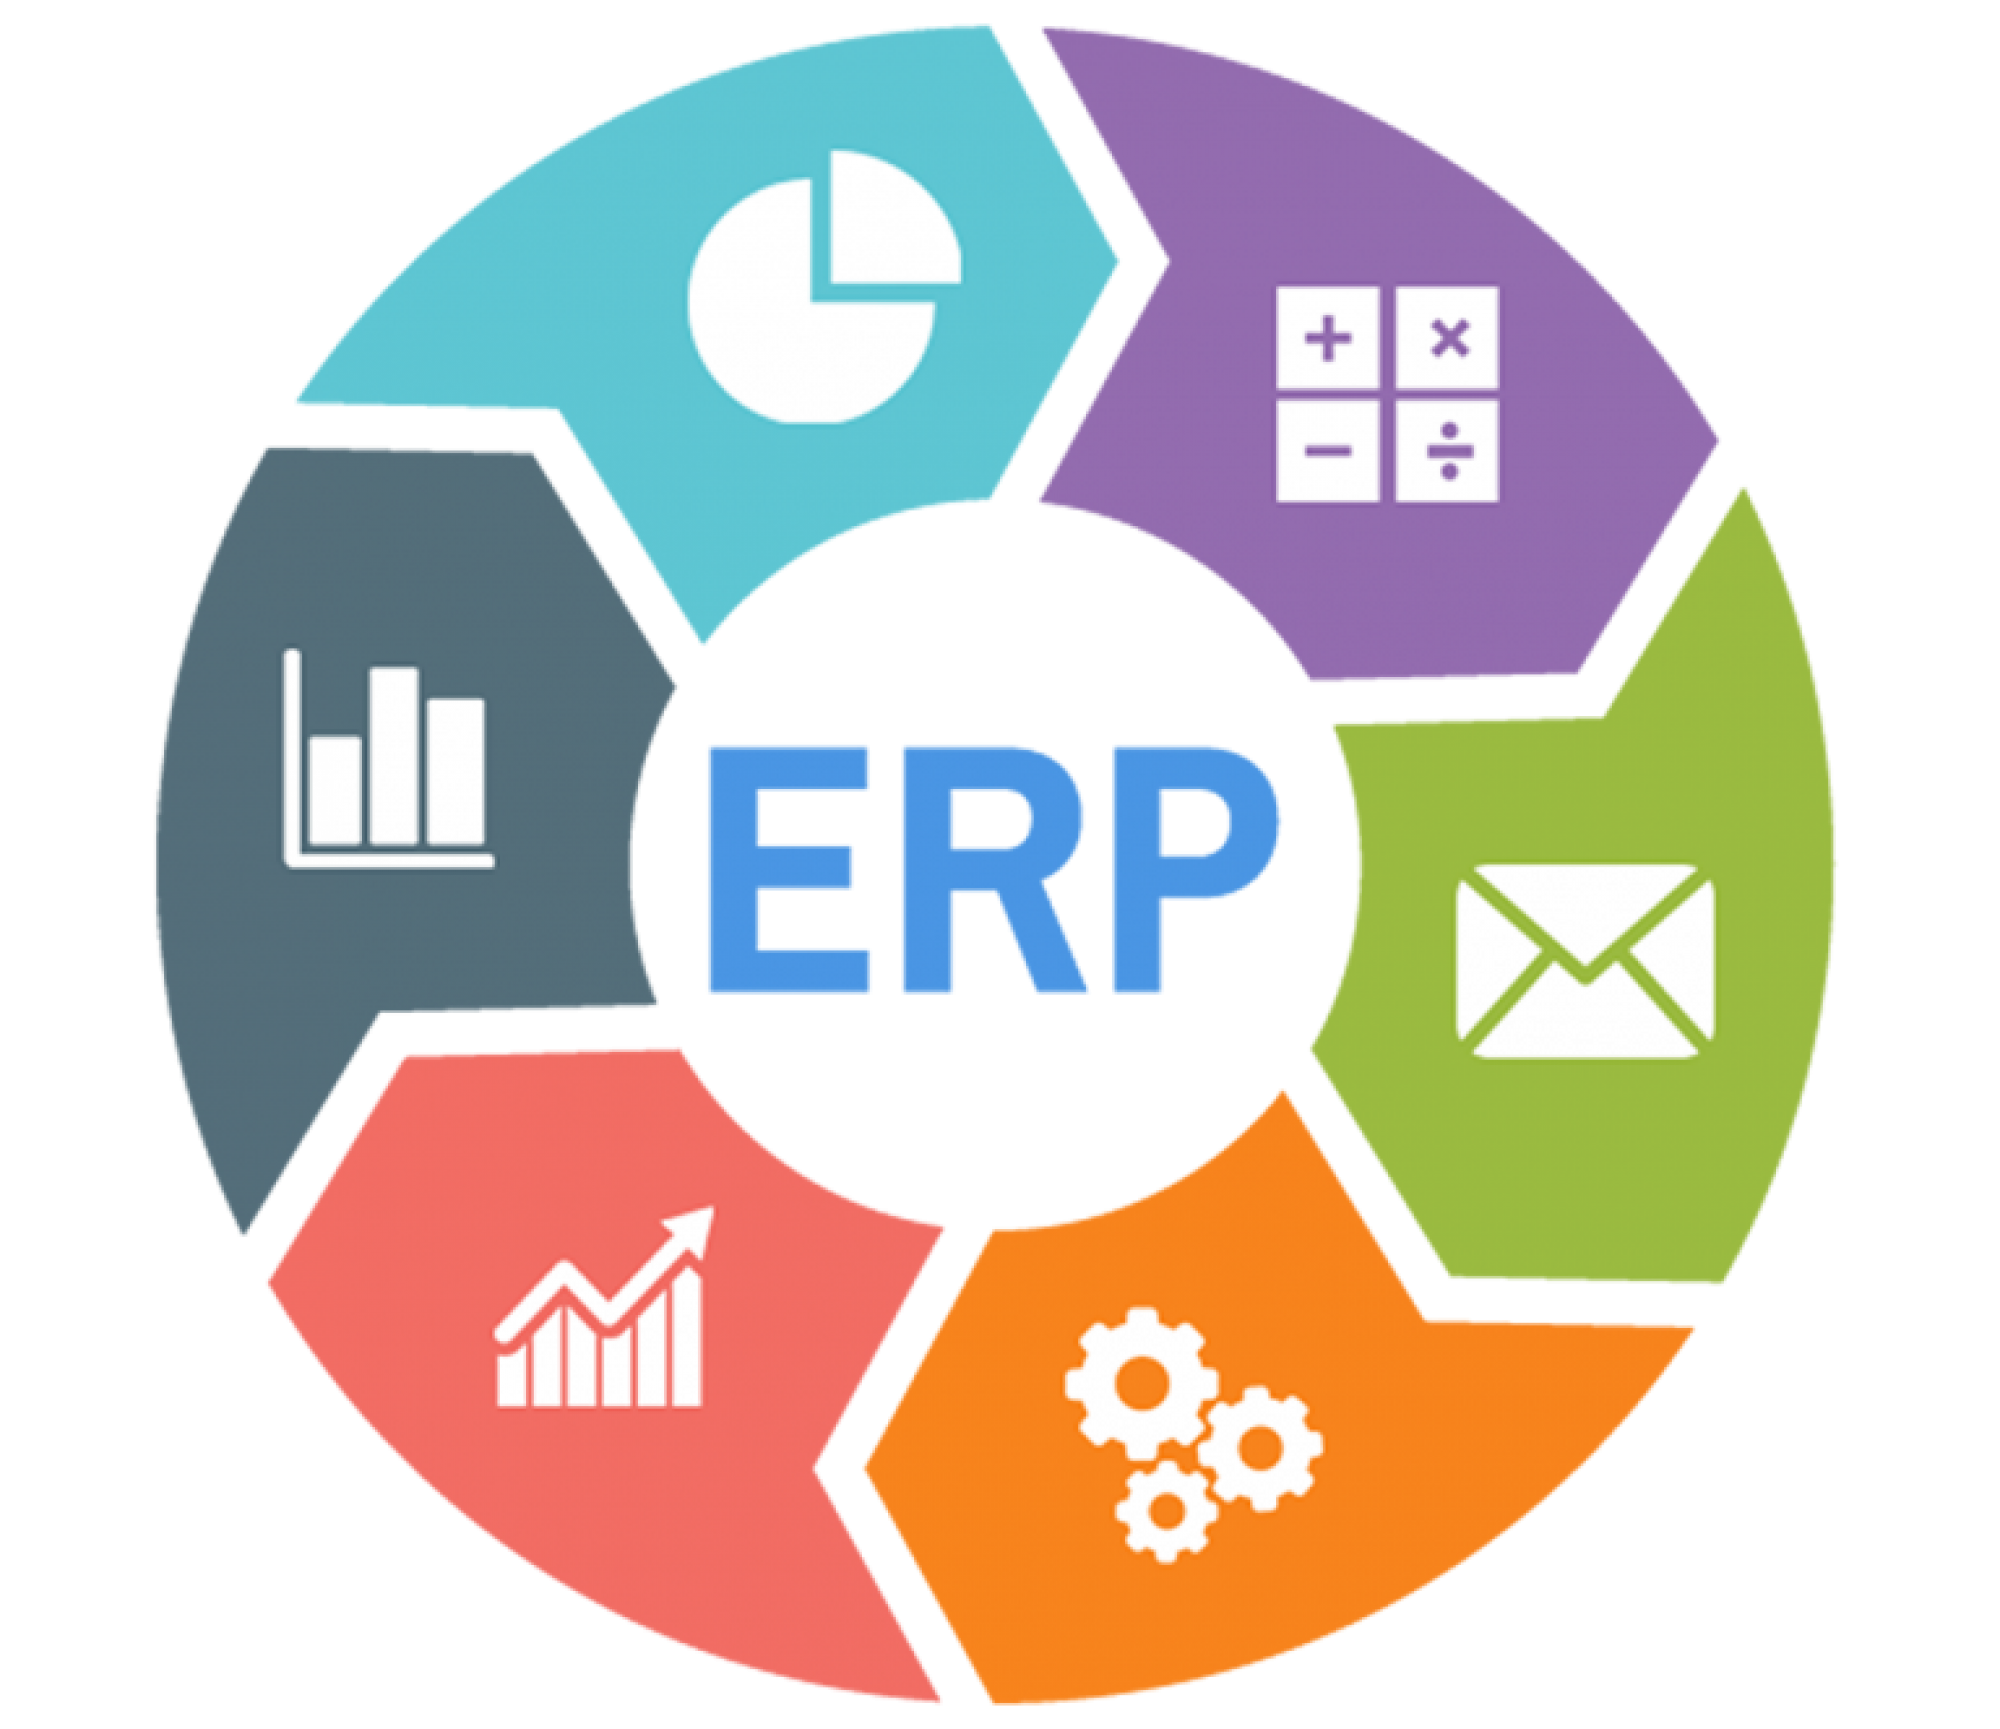 kisspng-enterprise-resource-planning-software-testing-pene-erp-corewin-5b8169eb28f038.7851452515352079151677